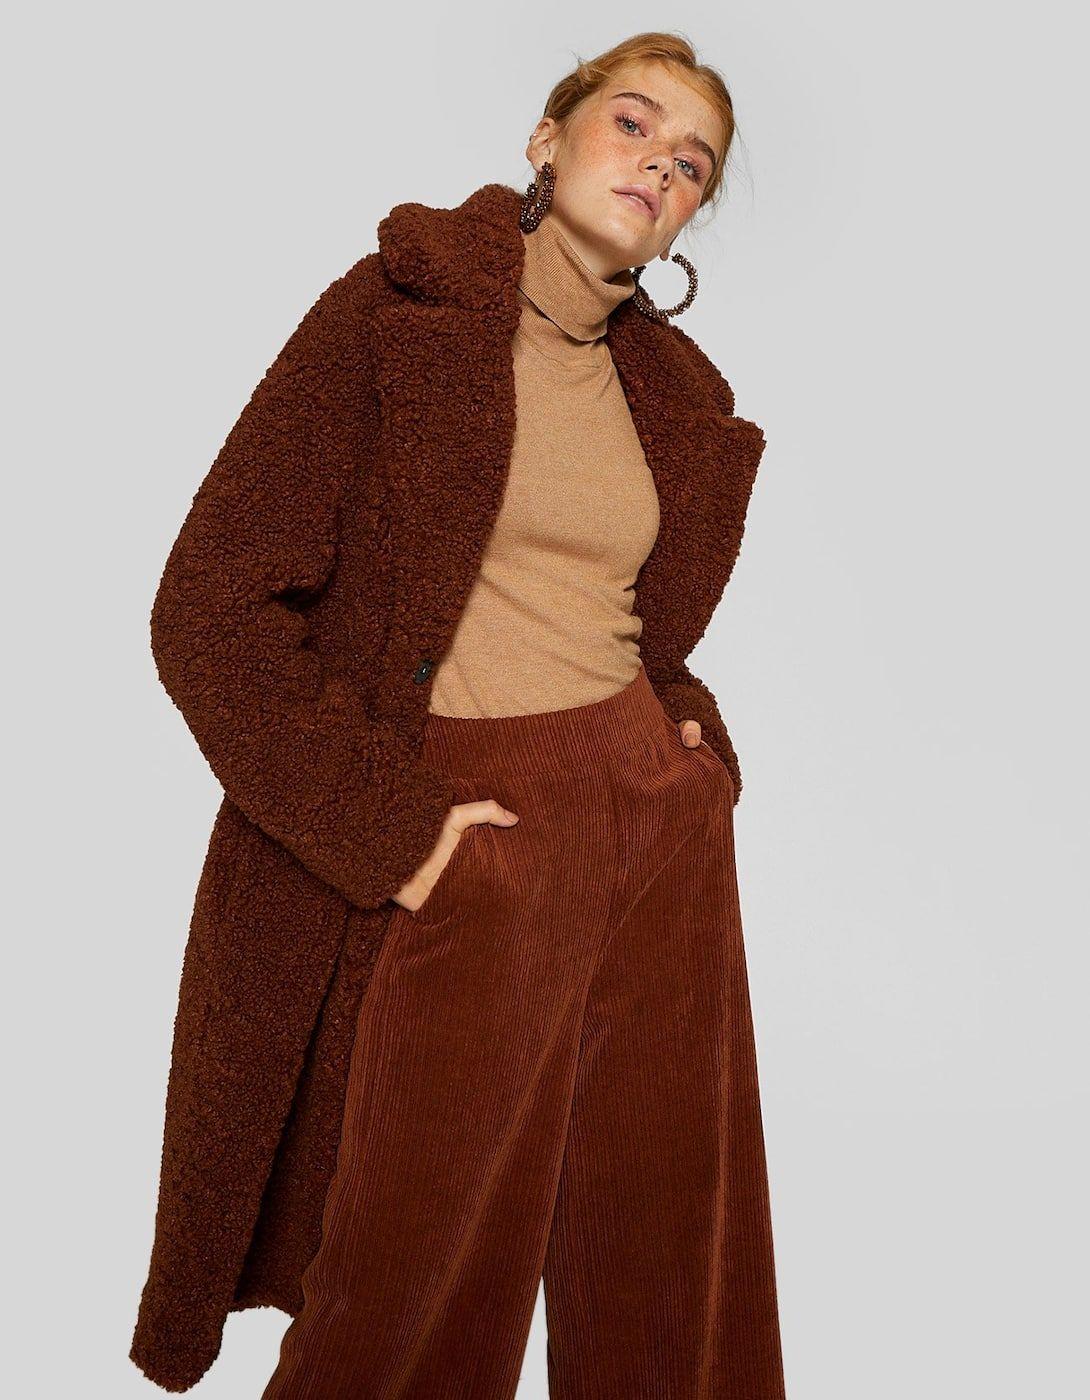 204b0d06 Estos 30 abrigos peluche te abrazarán en la ola de frío - Abrigos-peluche  para sobrevivir al frío